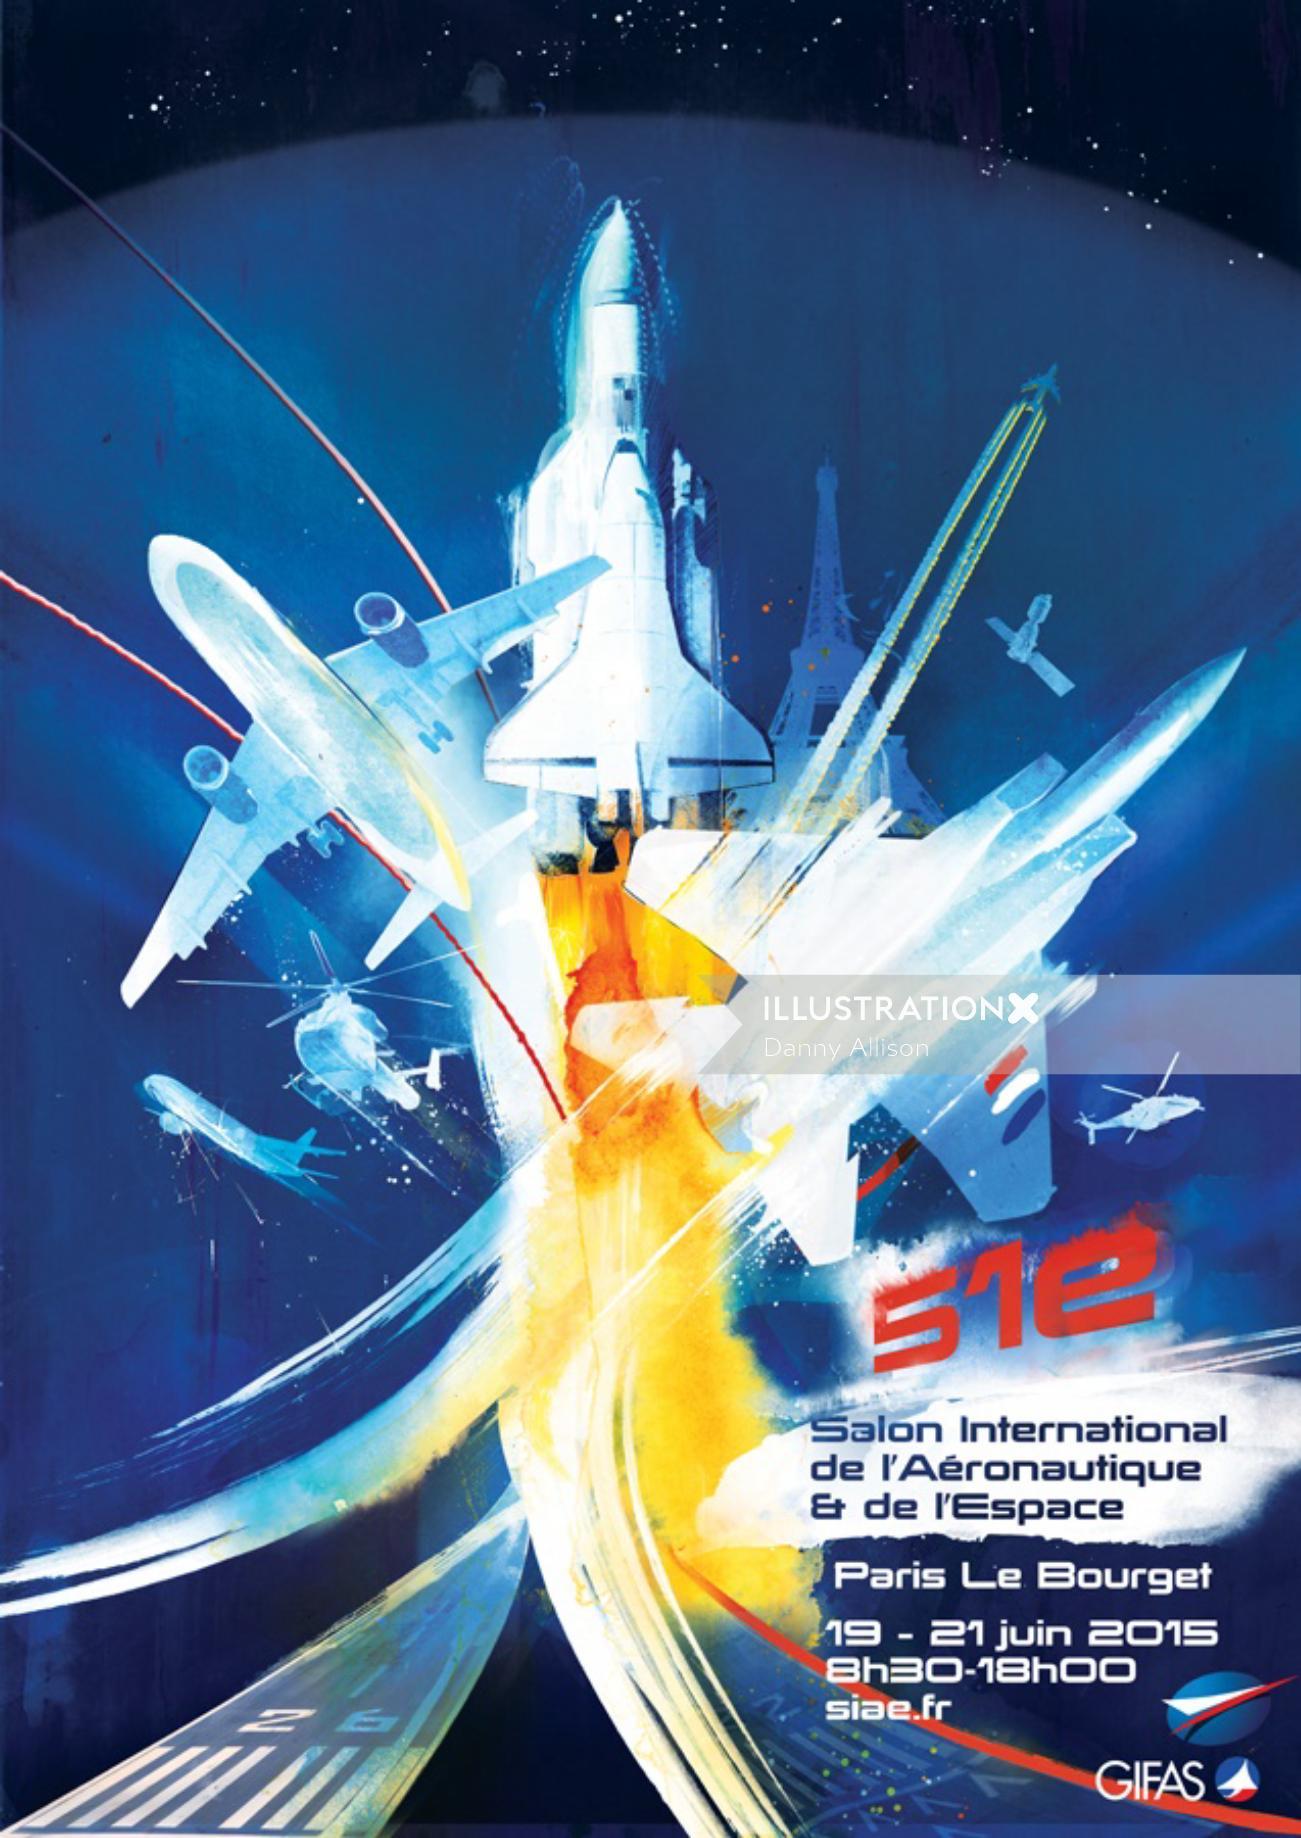 travel takeoff plane transport space shuttle helicopter air show paris satellite runway flight